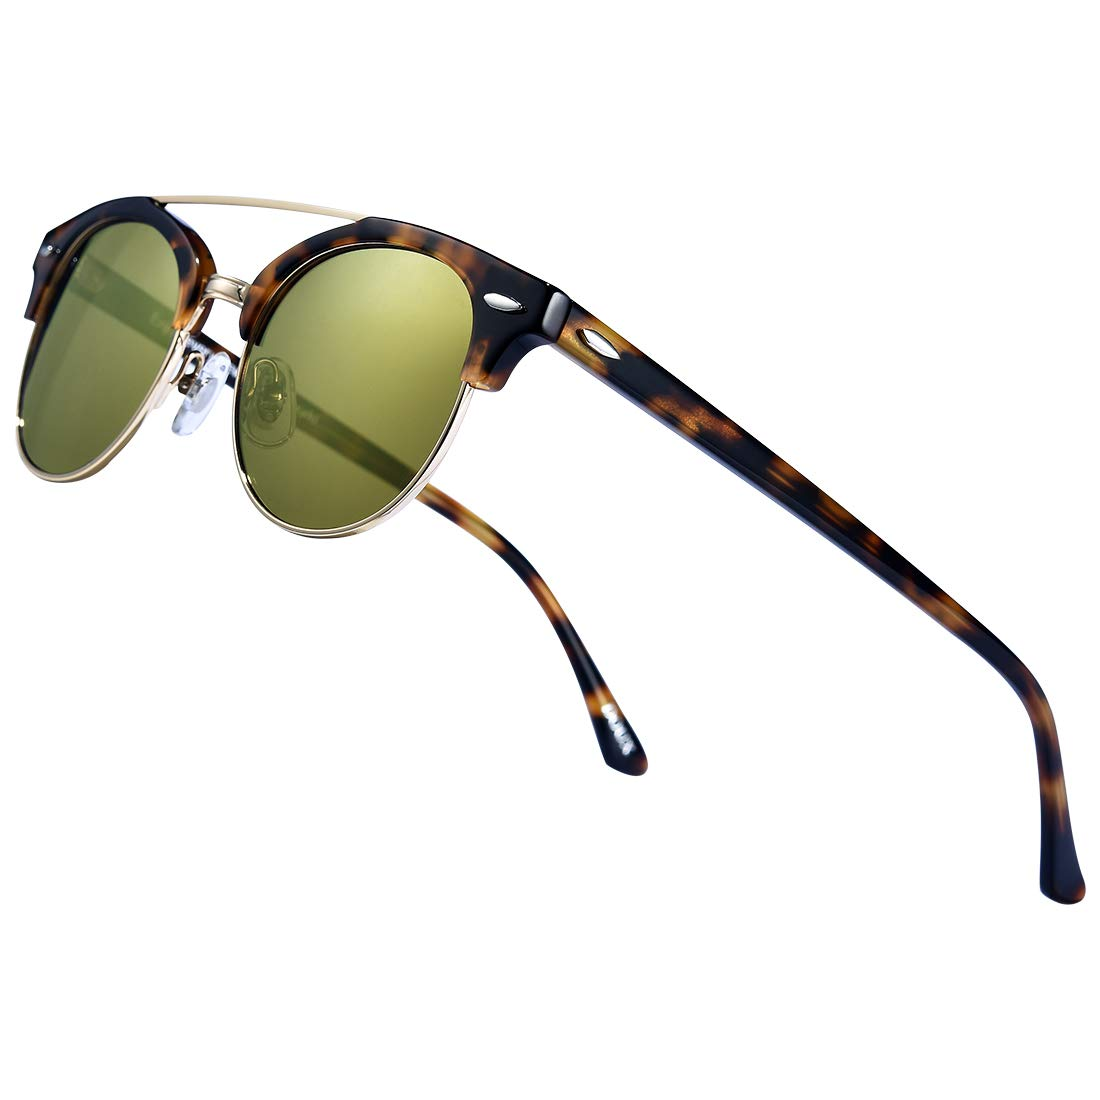 Retro Wayfare Polarized Sunglasses Half Frame丨DOUX Semi-Rimless Vintage Mirrored Lens by DOUX